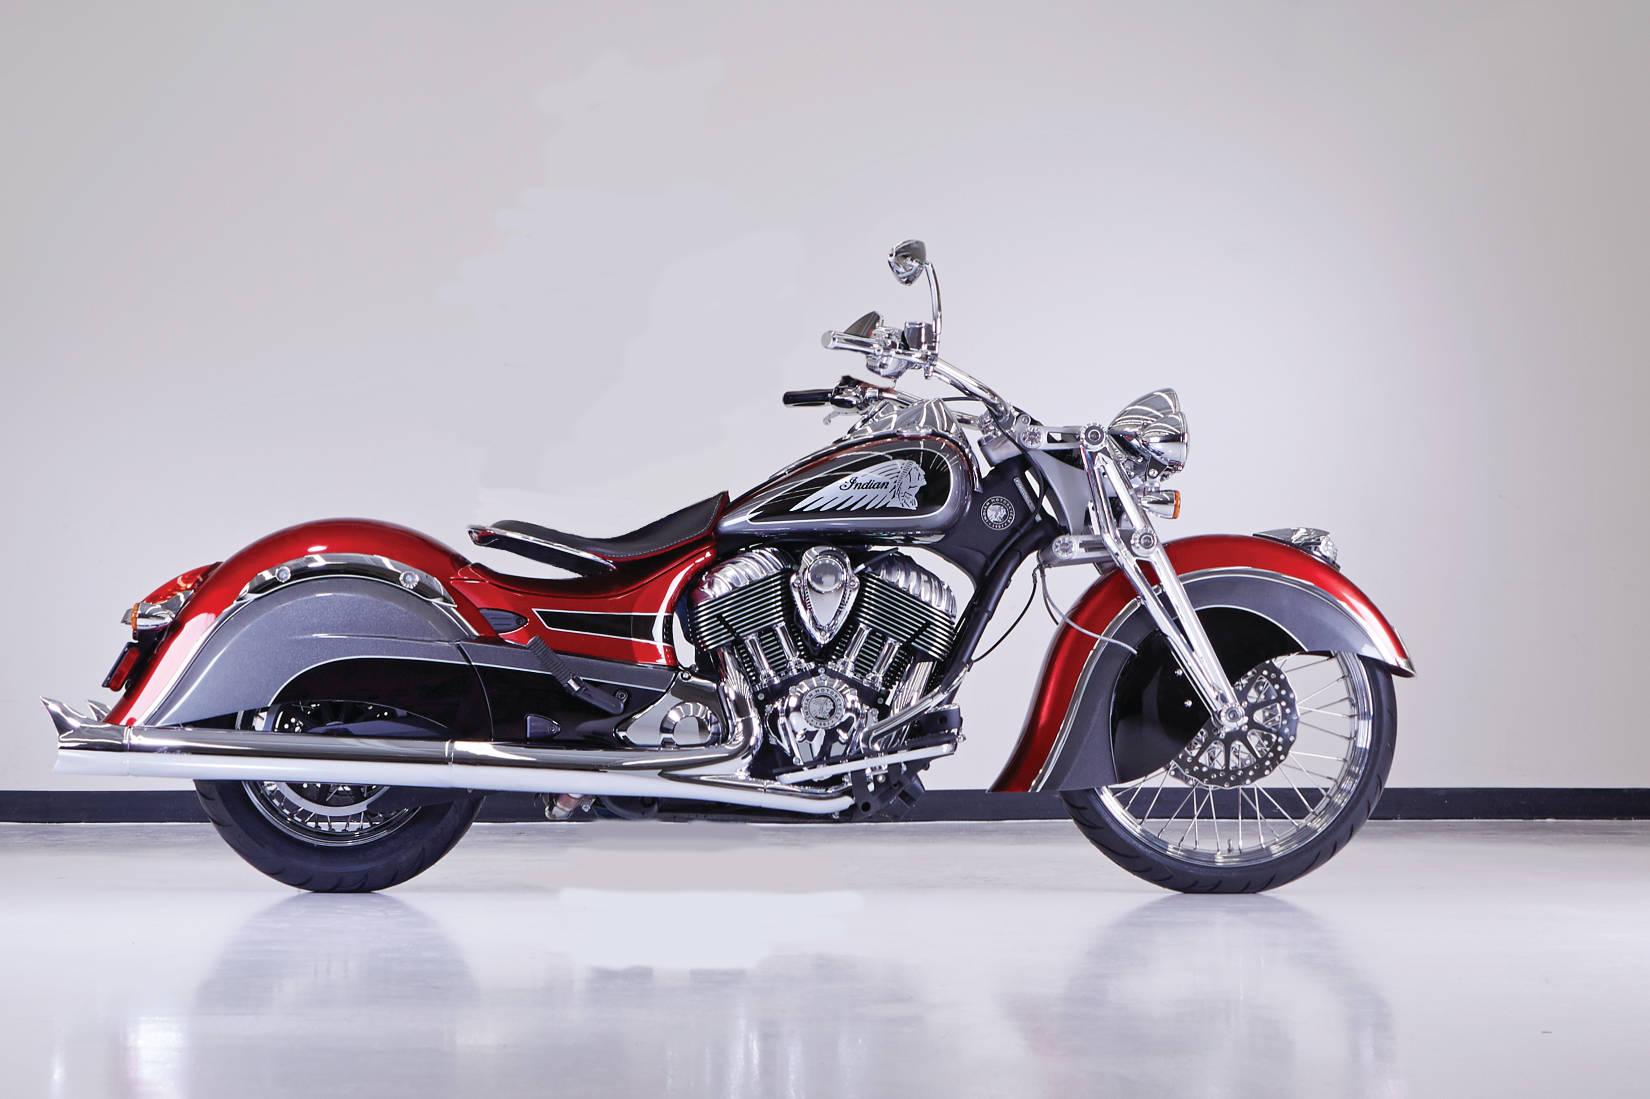 Custom Build using 111 motor in Early frame | Indian Motorcycle Forum